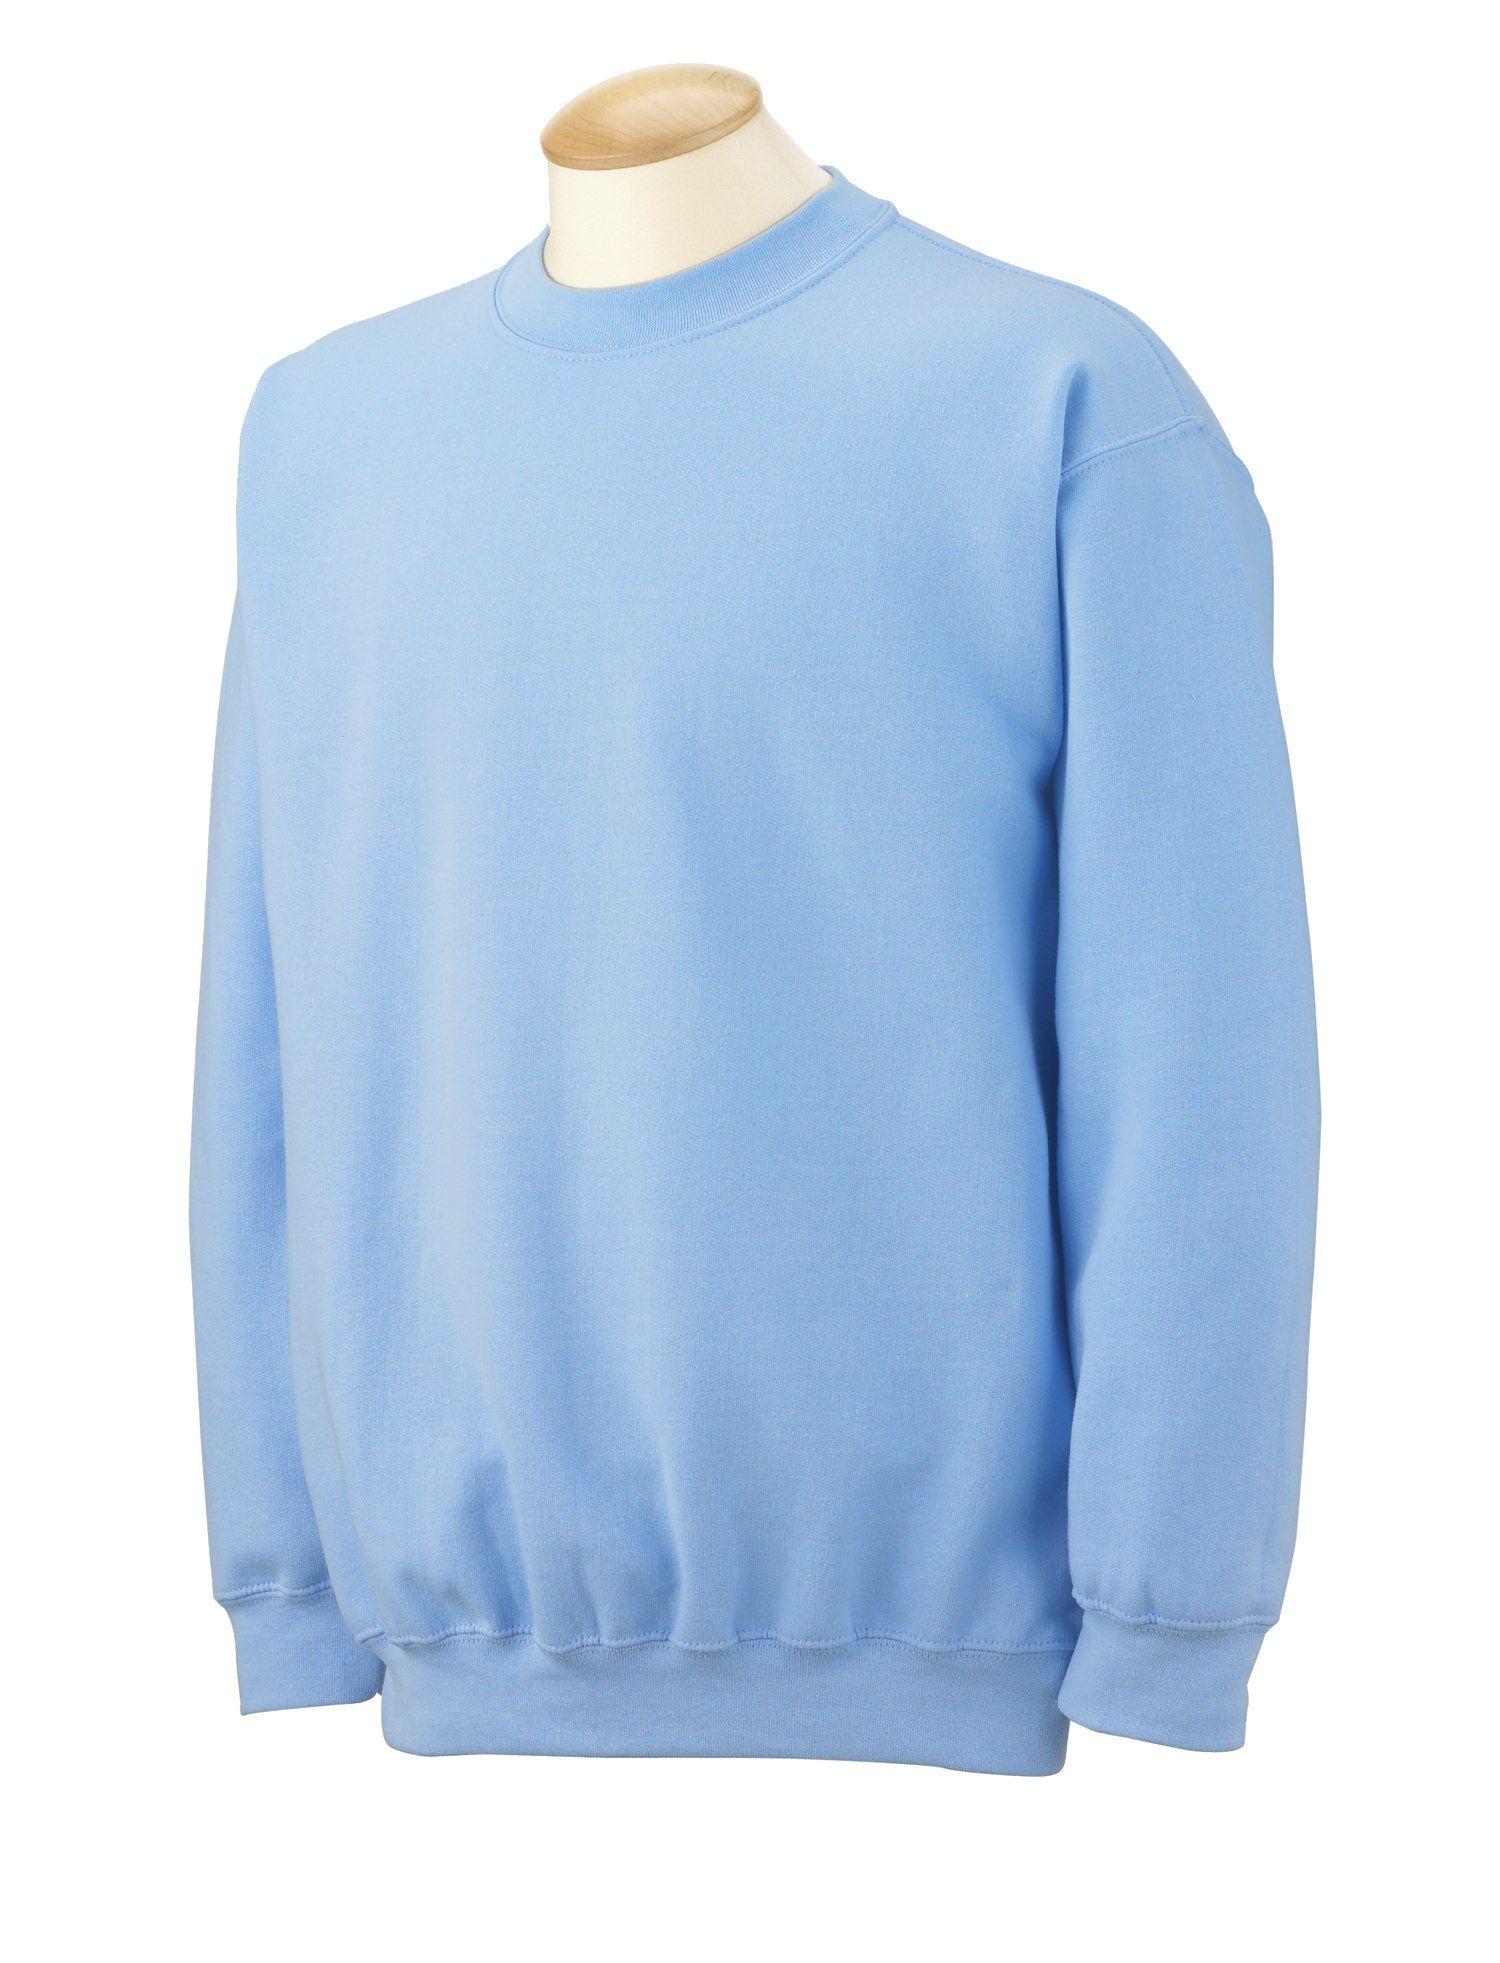 Amazon Com Gildan Men S Heavy Blend Crewneck Sweatshirt Clothing Crew Neck Sweatshirt Sweatshirts Mens Fleece [ 1963 x 1500 Pixel ]